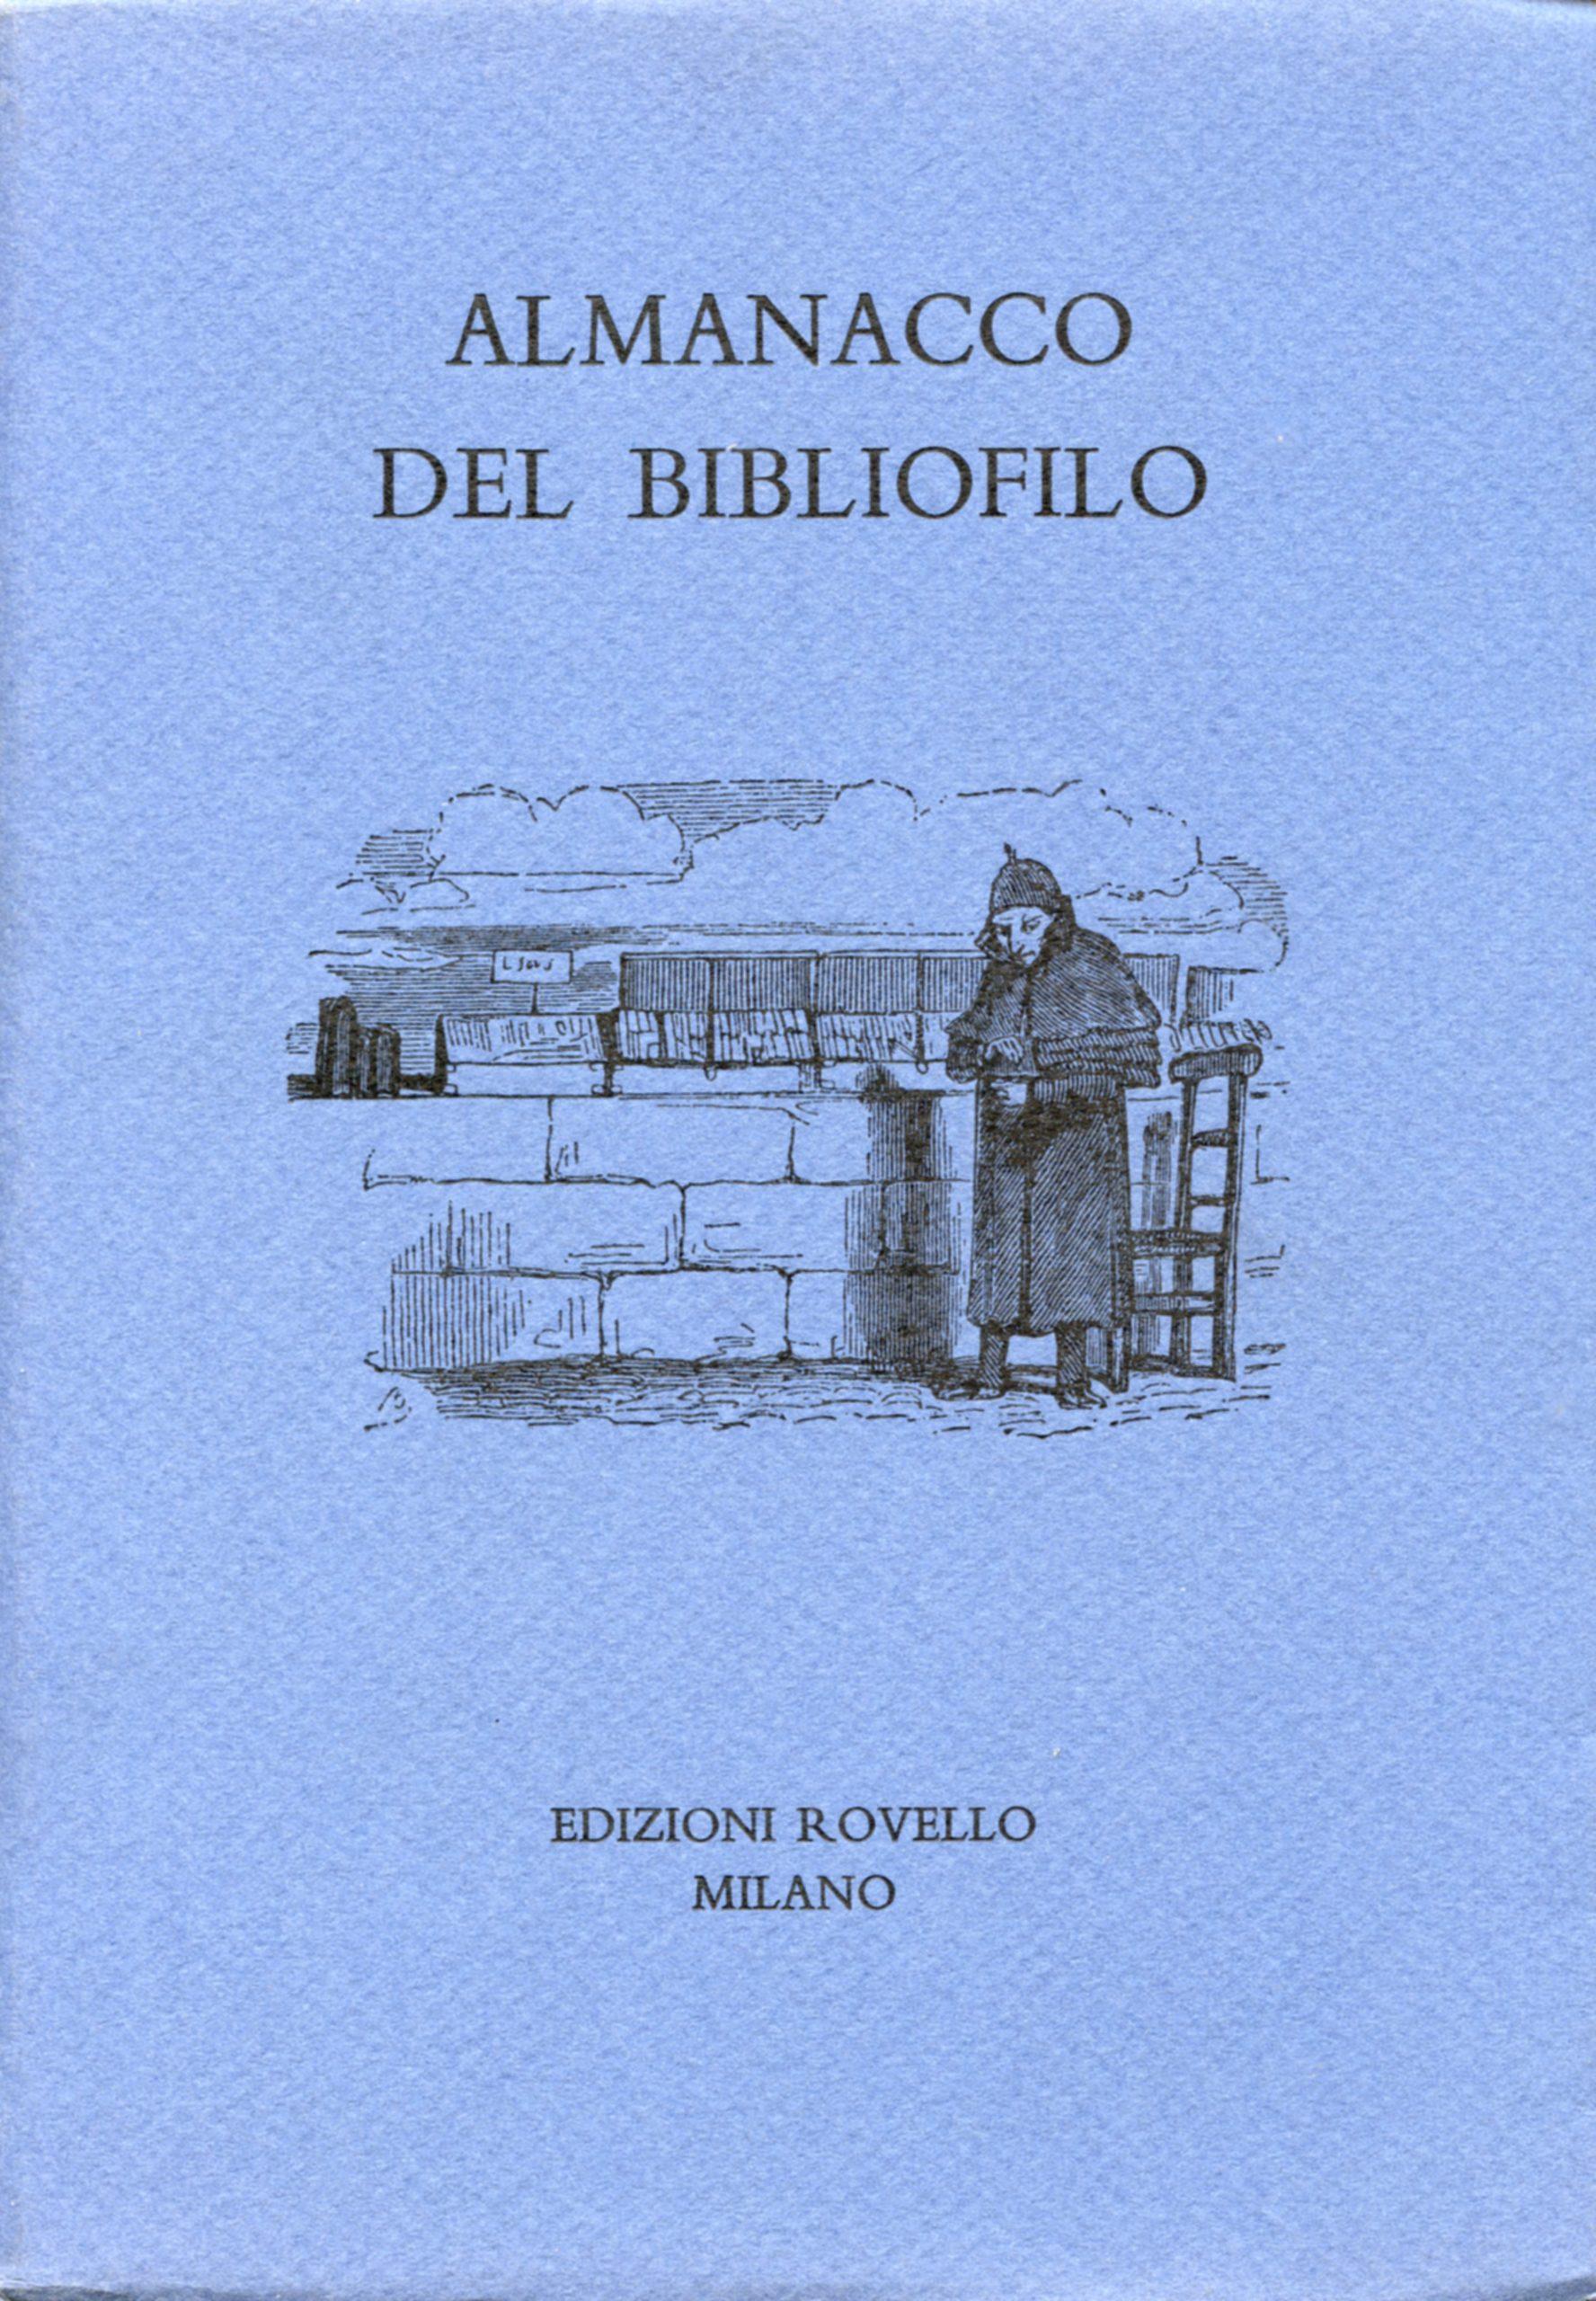 4. Amor librorum – Notizie e curiosità (1993)